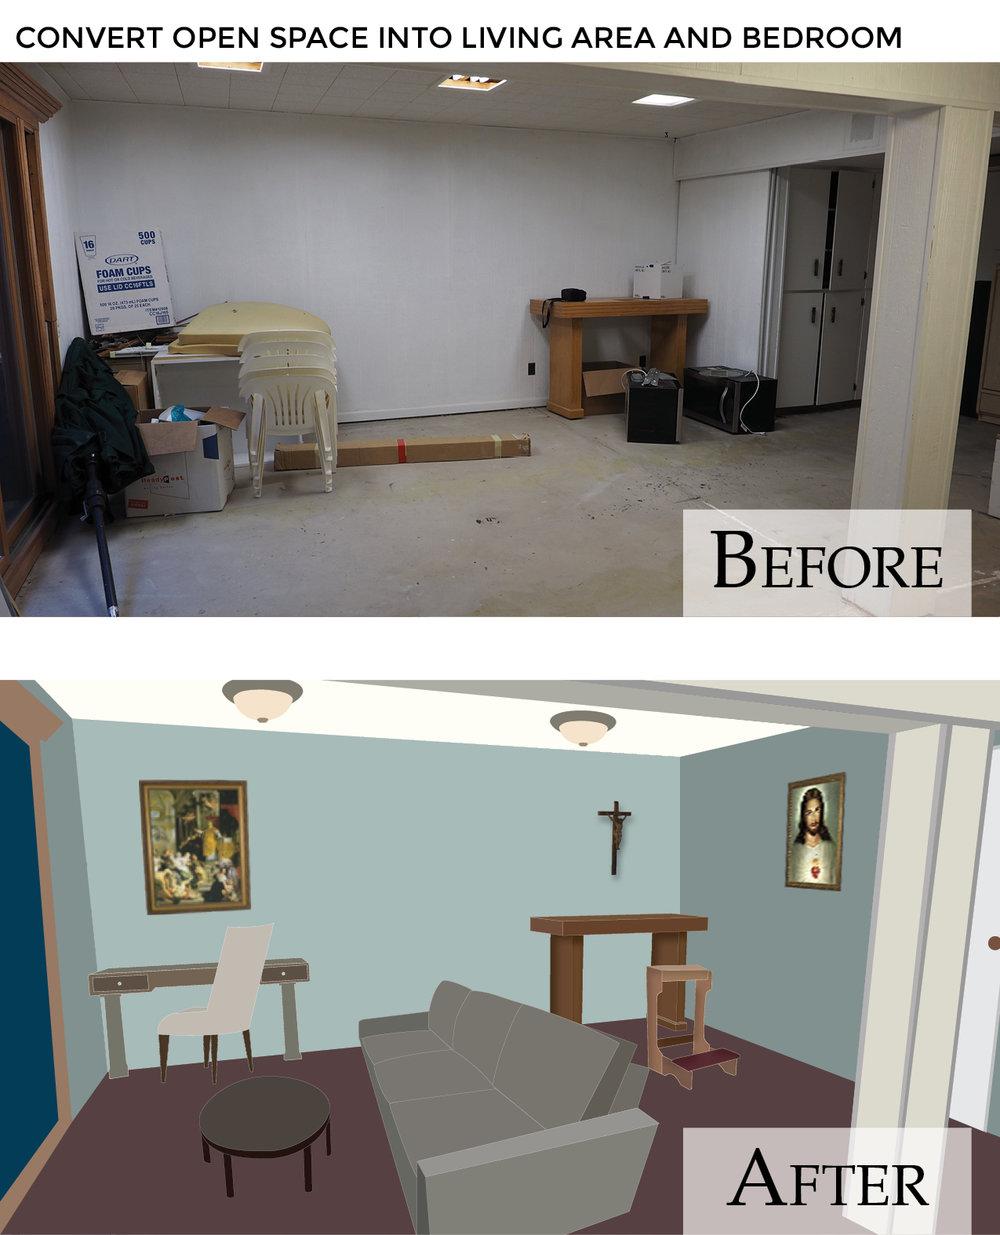 Hermitage Appeal Web - Living area-Bedroom Before & After.jpg